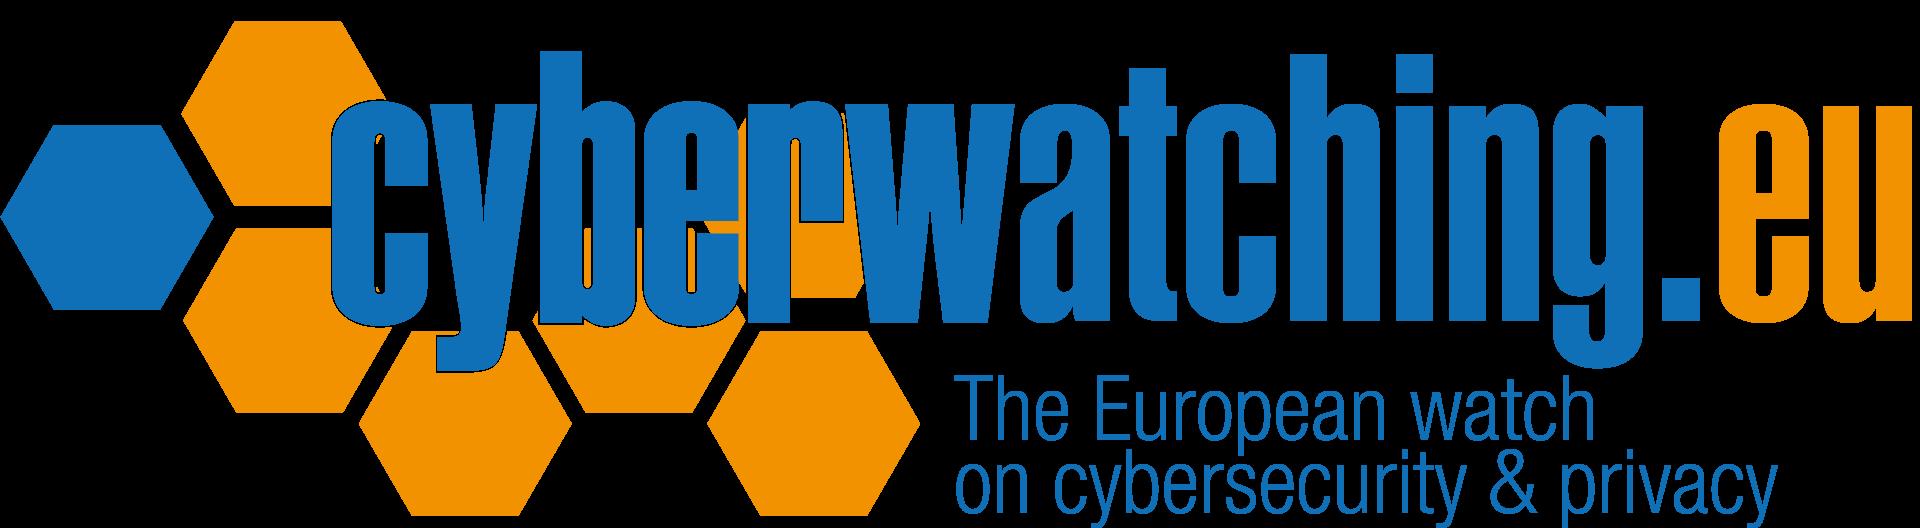 Cyberwatching_logo_nuova_vers.png